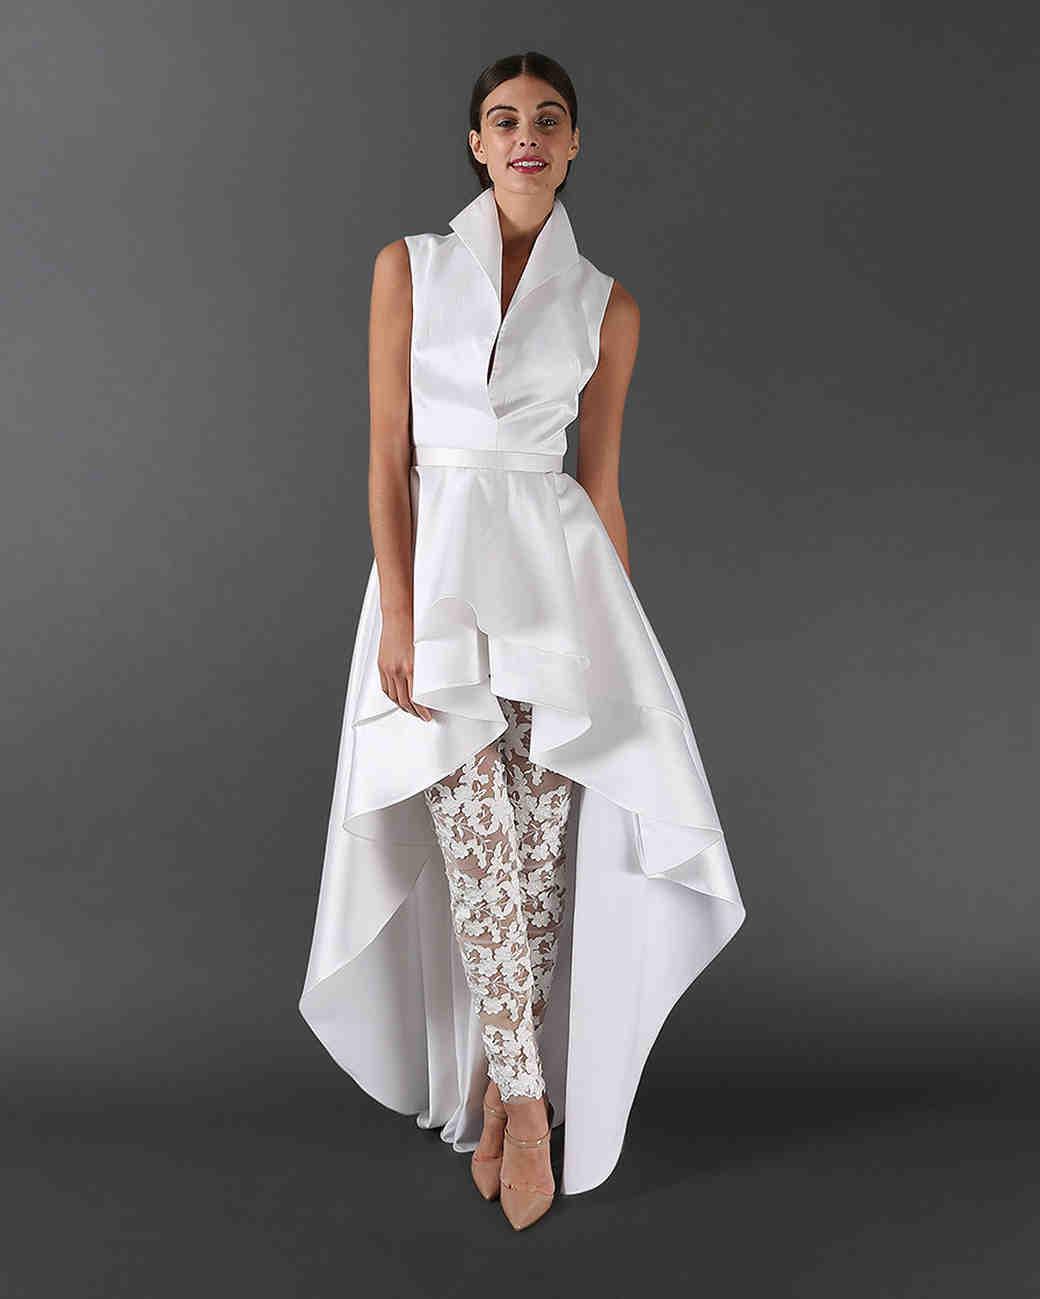 Plus Size Wedding Dresses with Pocket